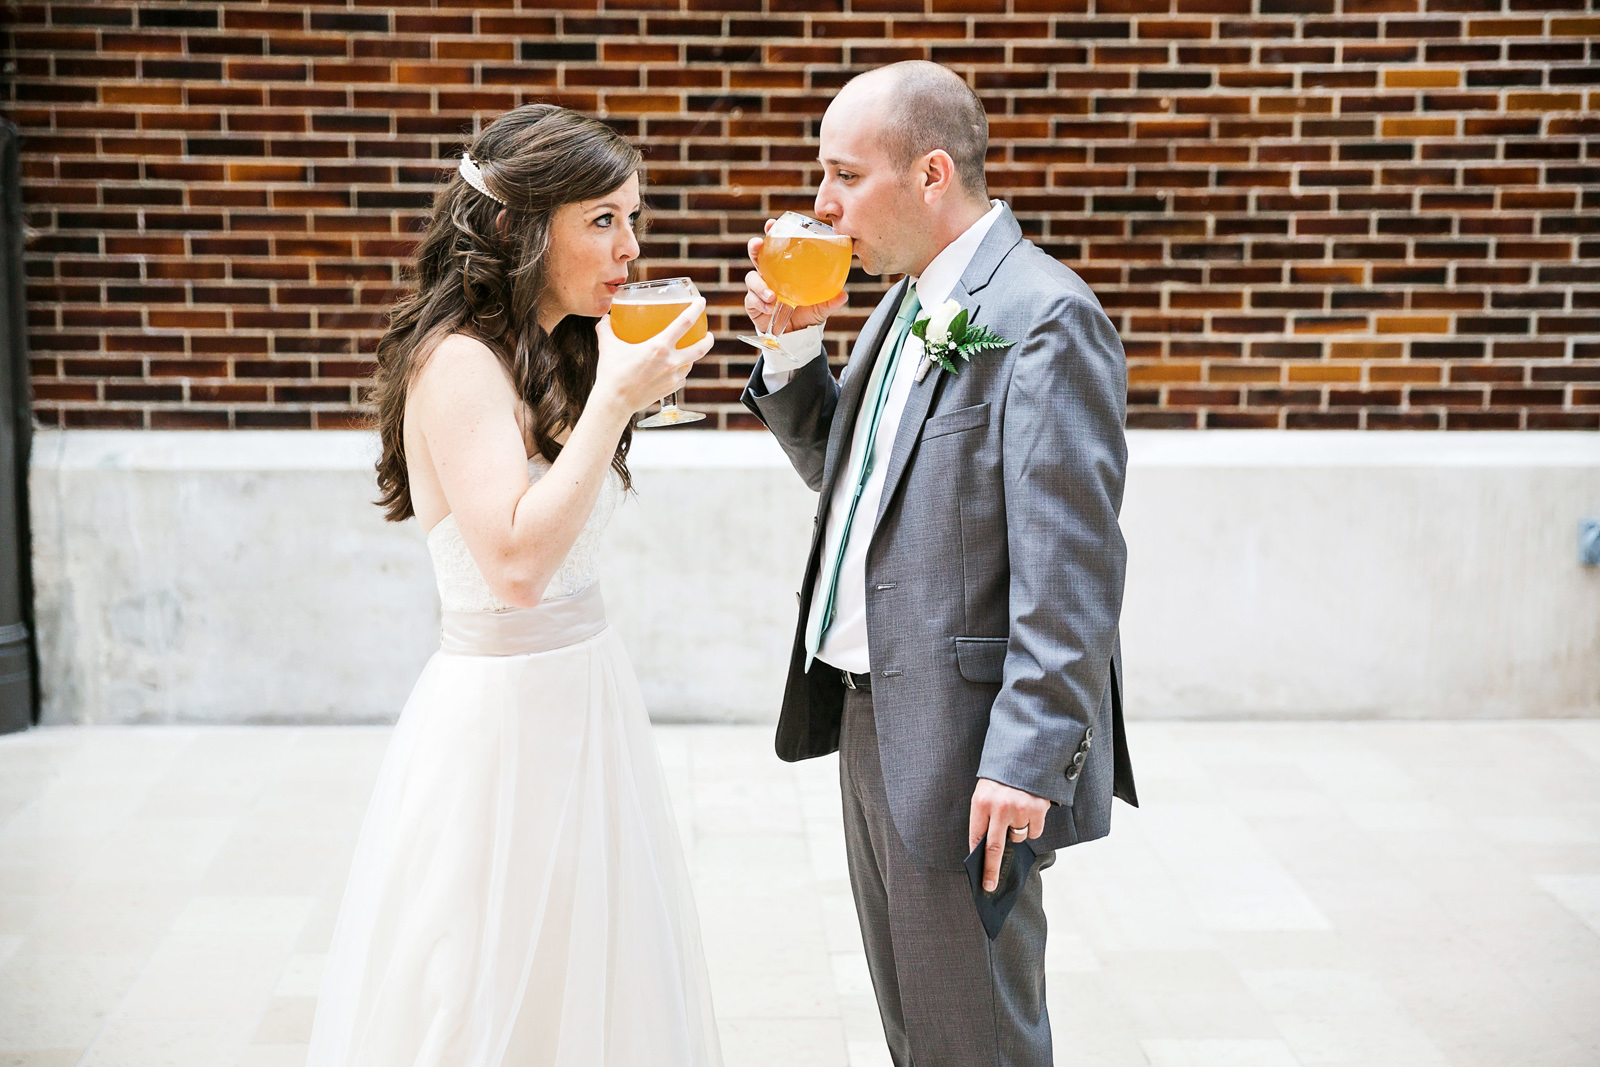 Oldani-Photography-St-Louis-Union-Station-Wedding-Party-wedding-photos_20140927_16121042.jpg